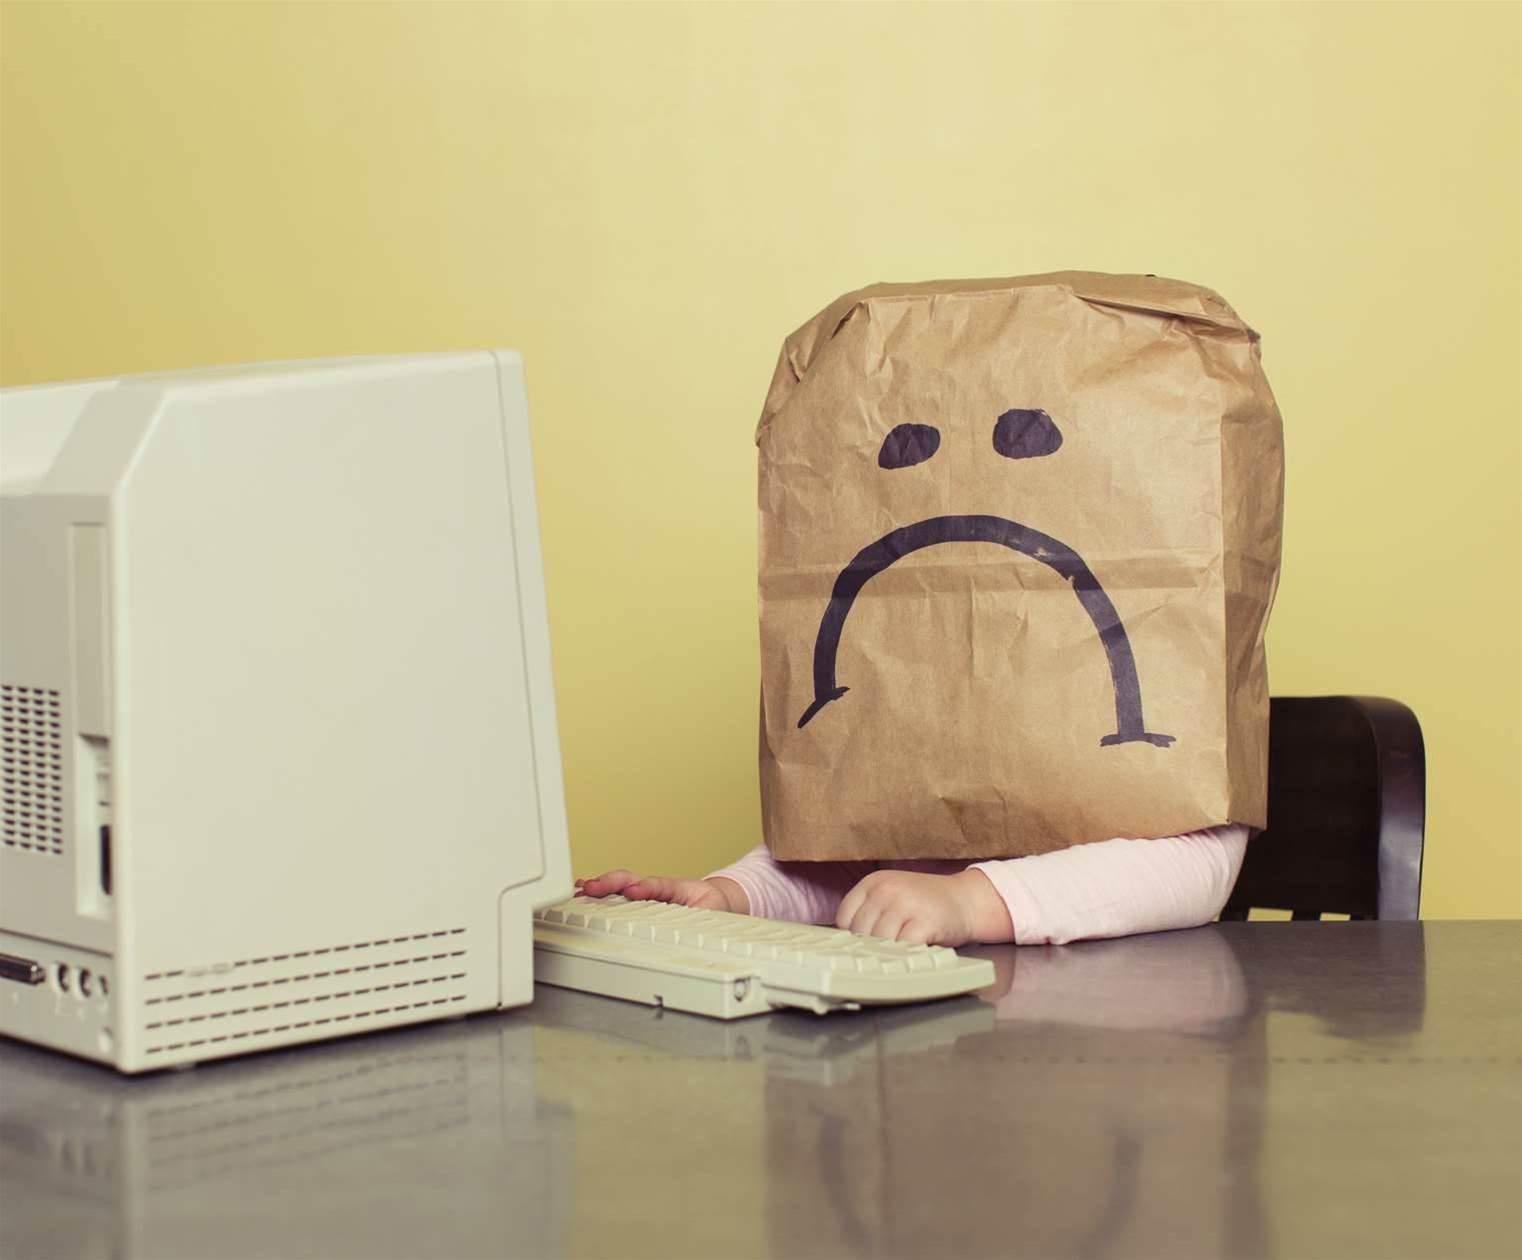 Windows Update breaking PCs running popular security software